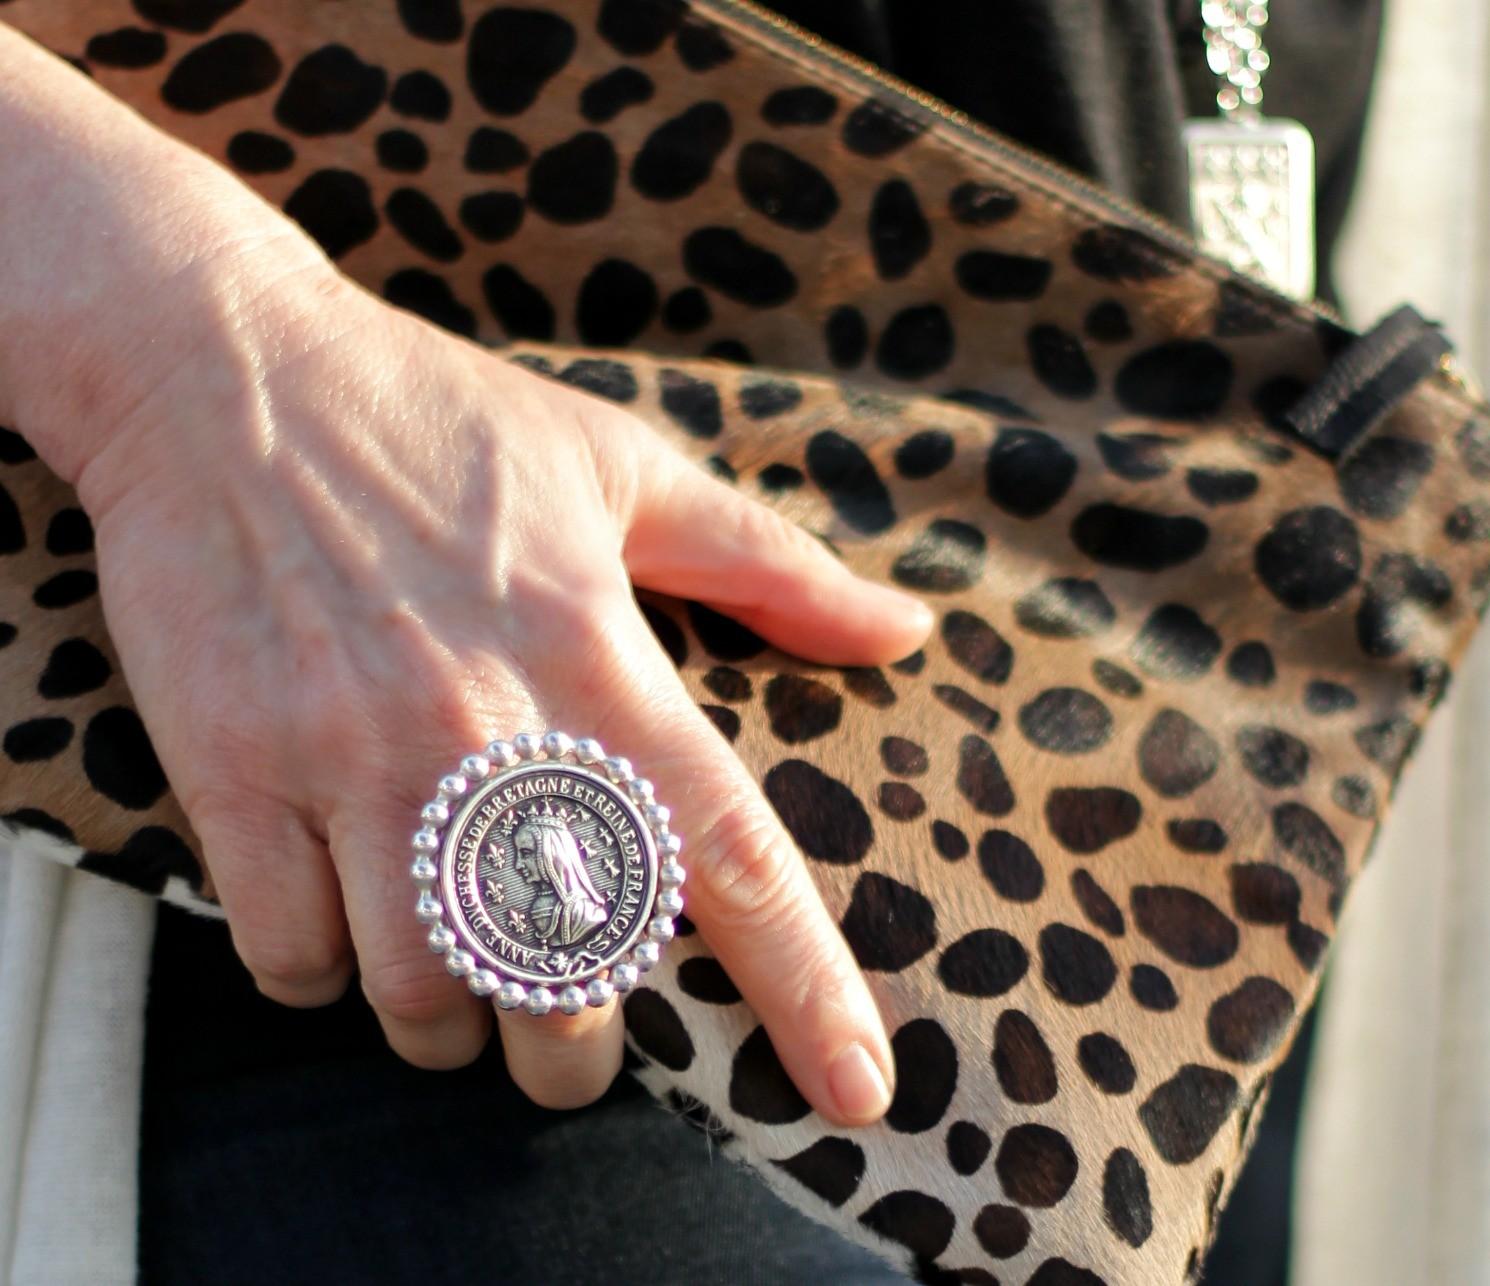 silver medallion ring, leopard clutch bag